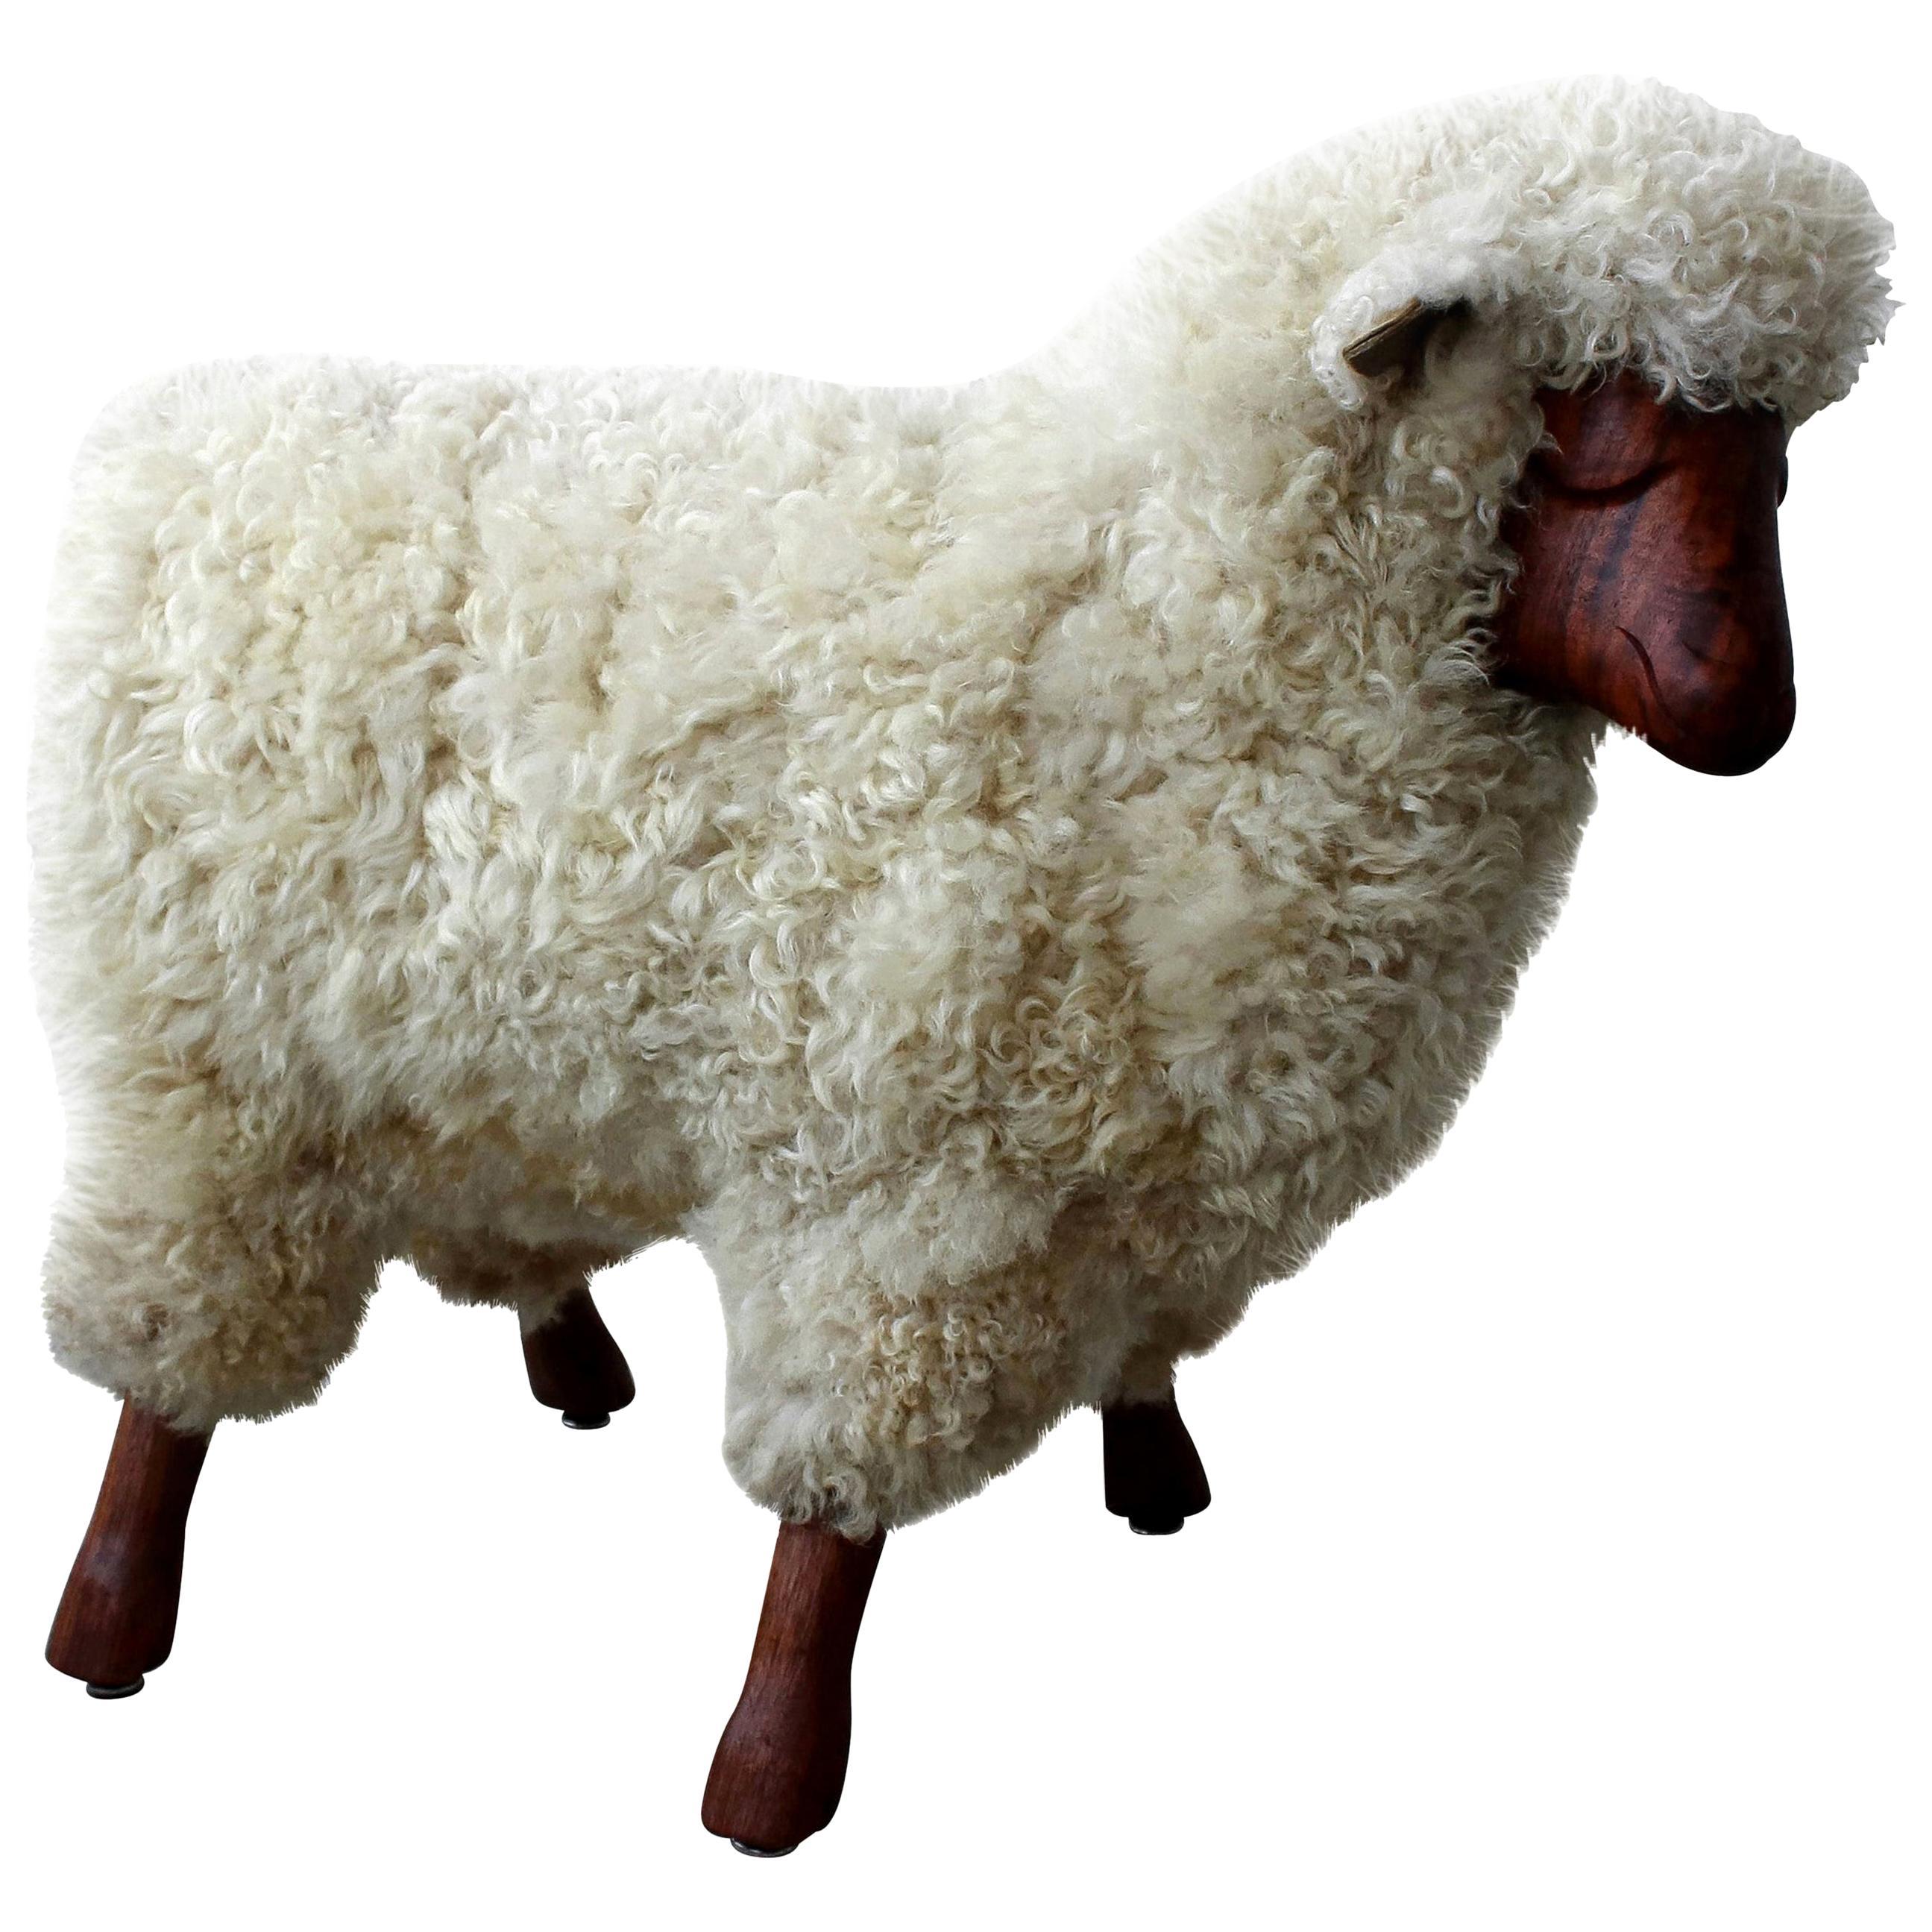 Midcentury Walnut and Wool Sheep Stool Sculpture